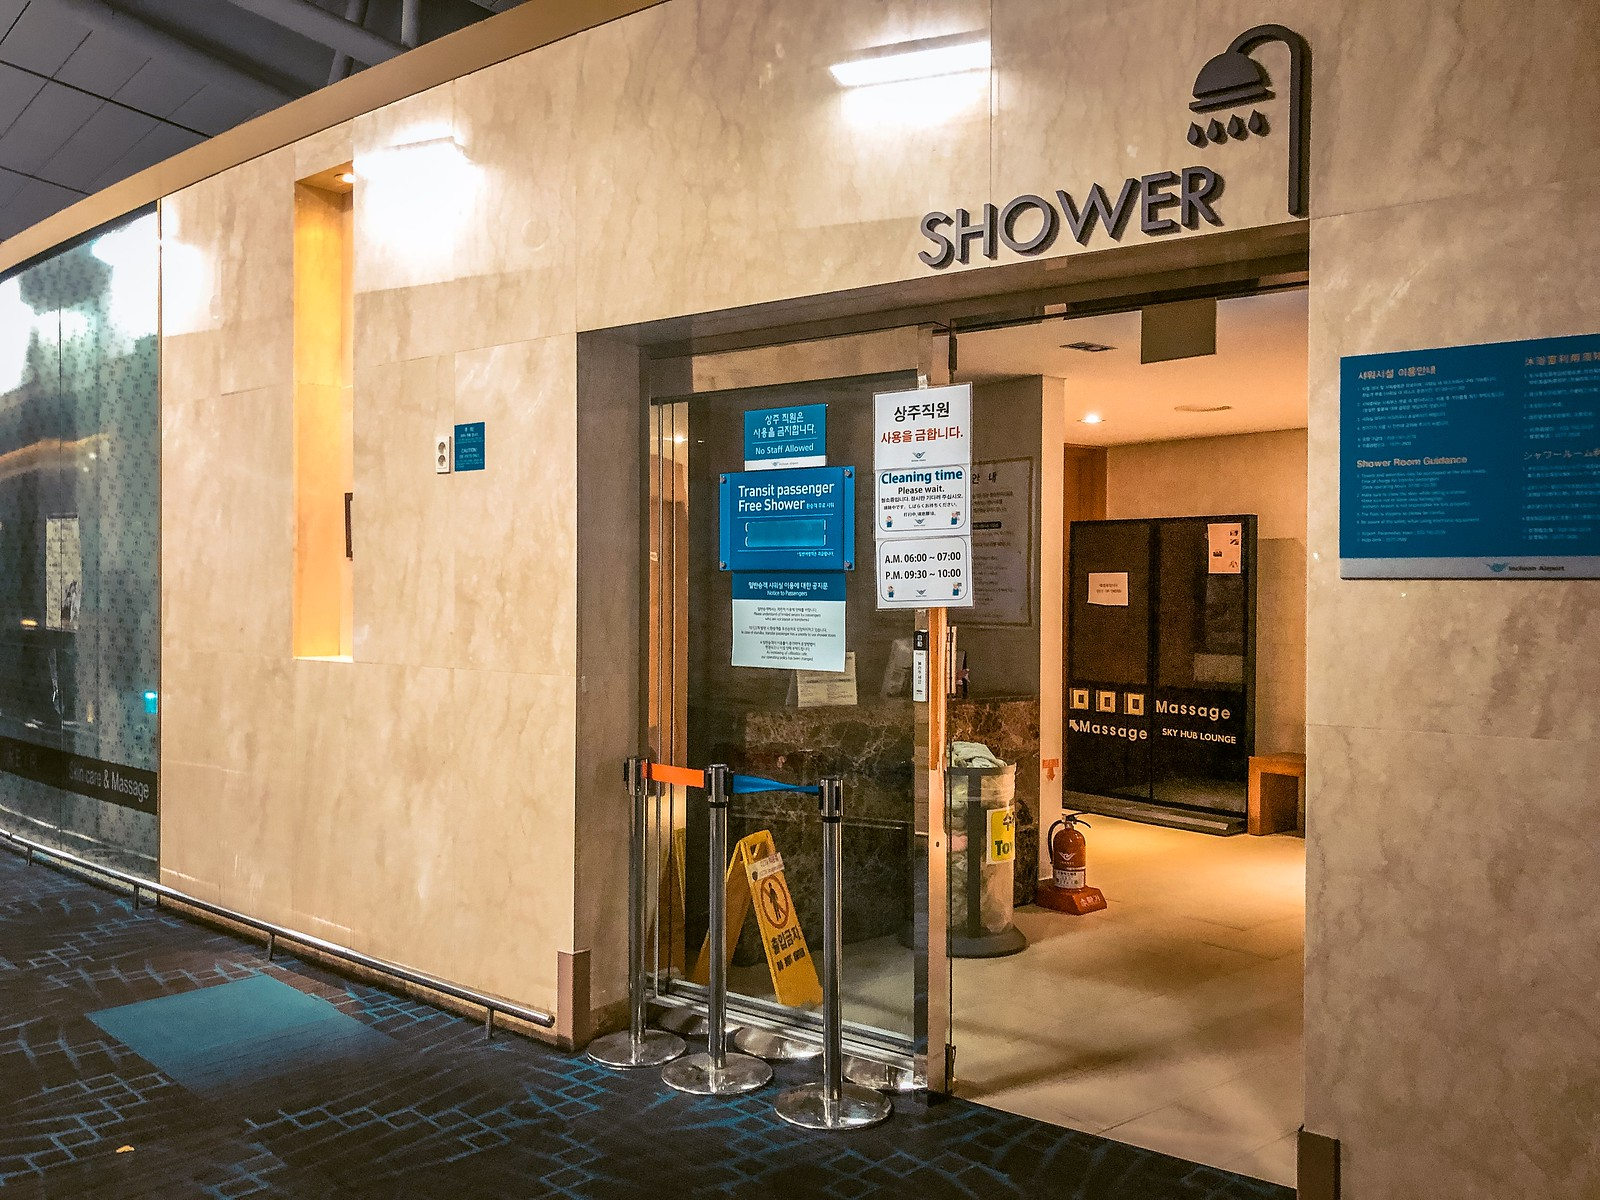 Free Shower